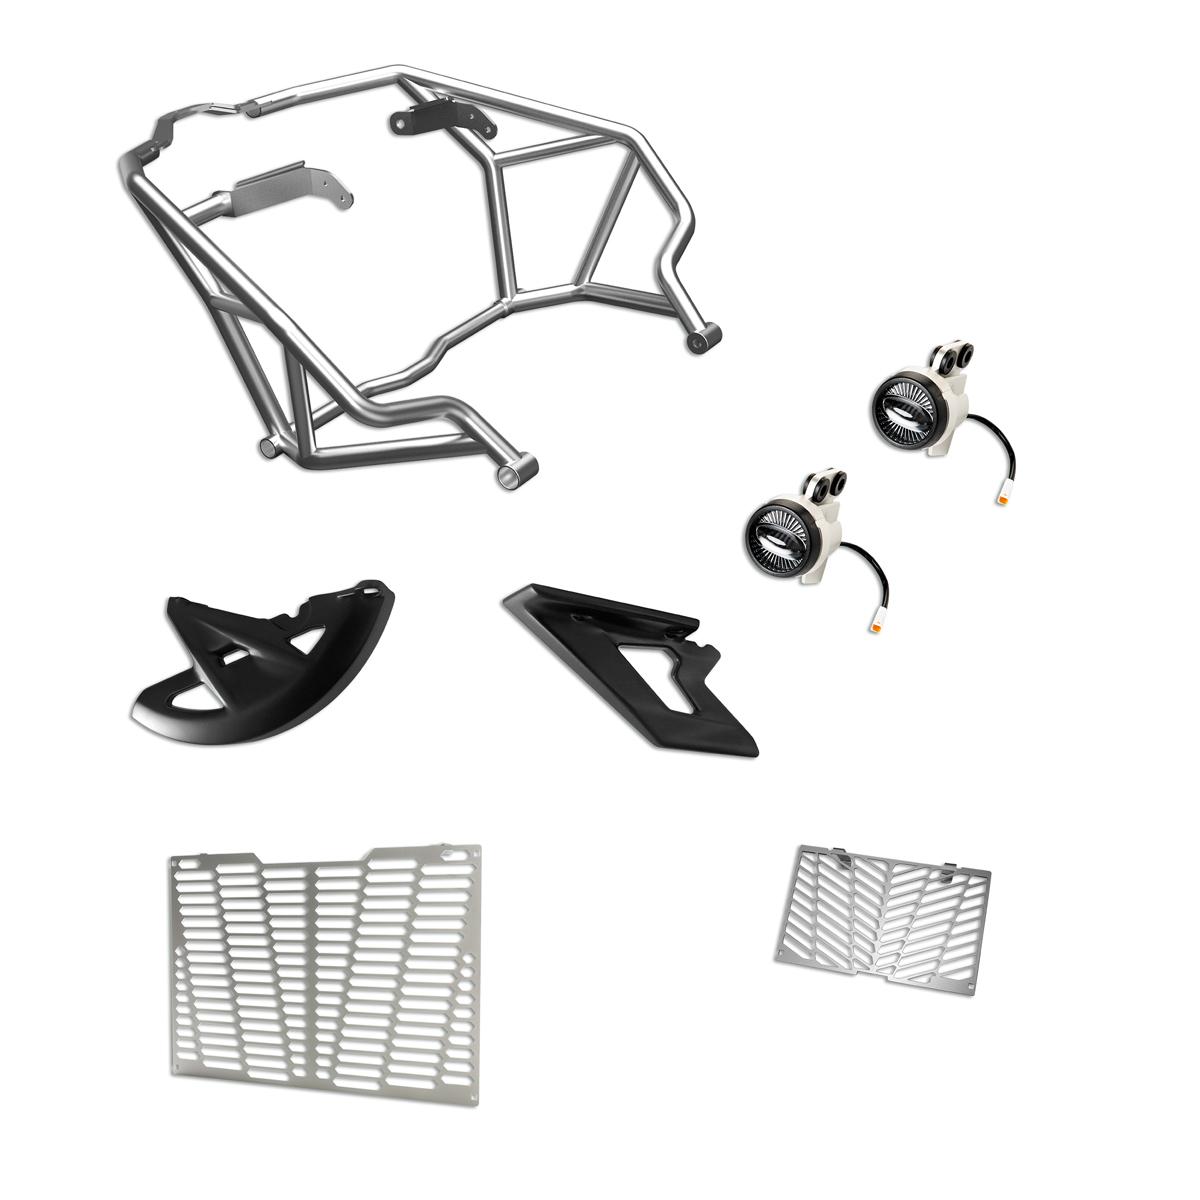 Multistrada 1200 Enduro accessory package.